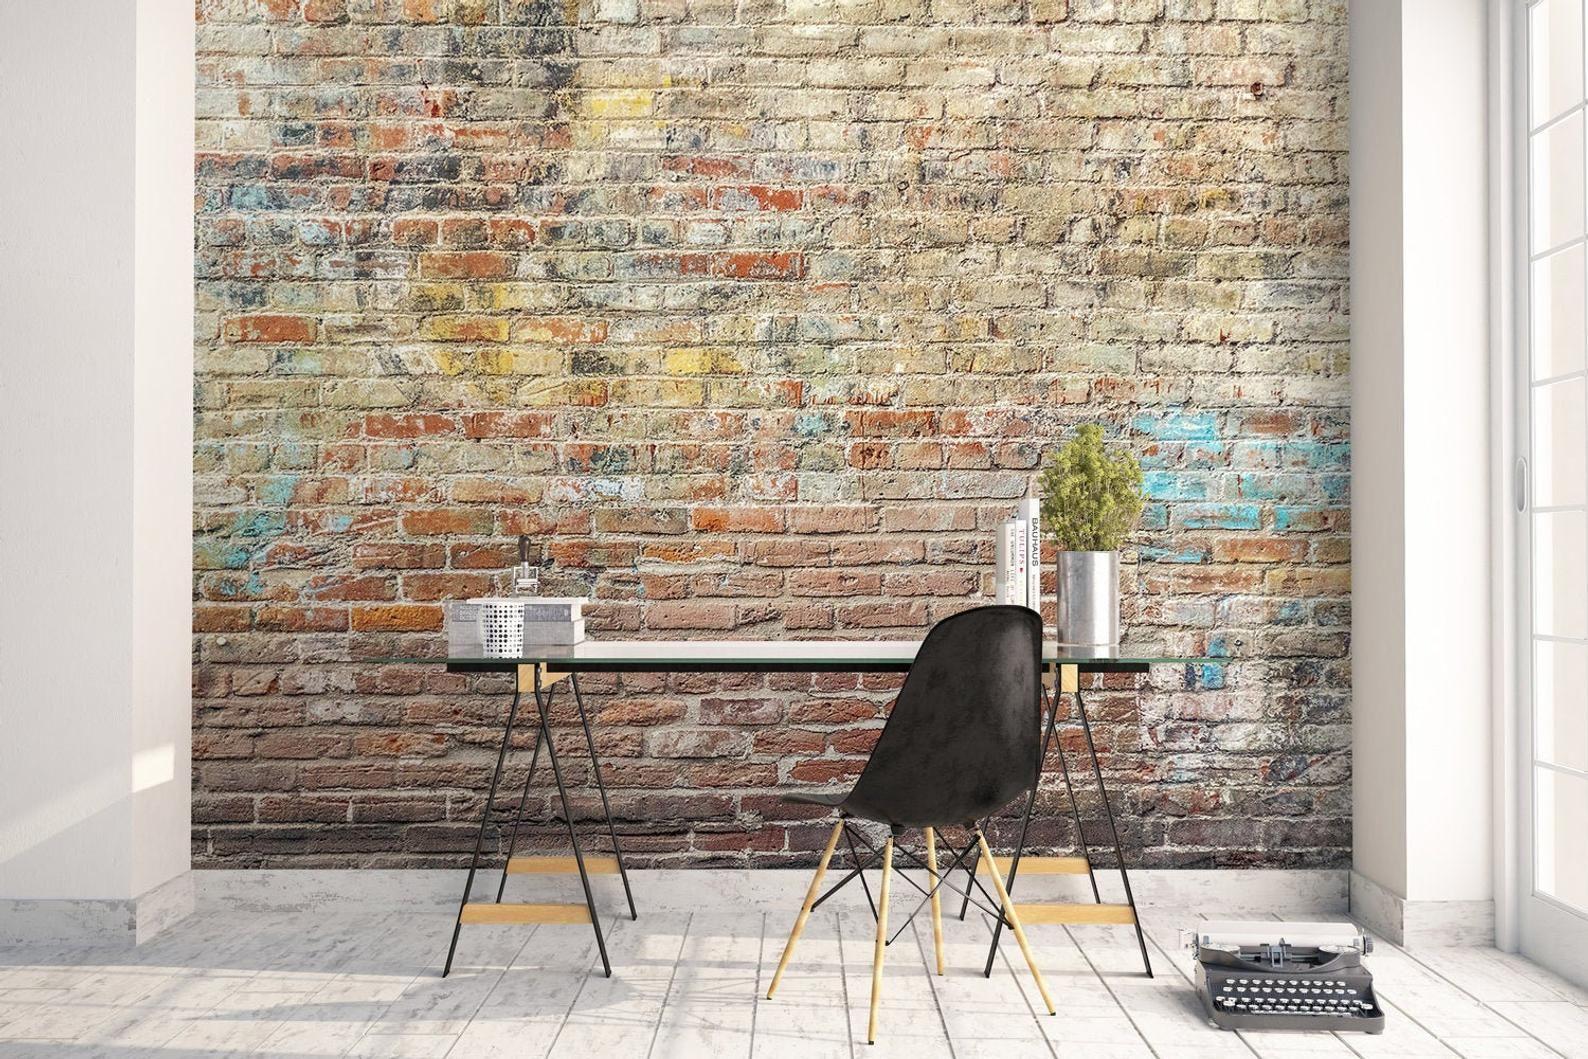 Peel And Stick Self Adhesive Faux Brick Wallpaper Removable Etsy In 2020 Faux Brick Wallpaper Removable Brick Wallpaper Brick Wallpaper